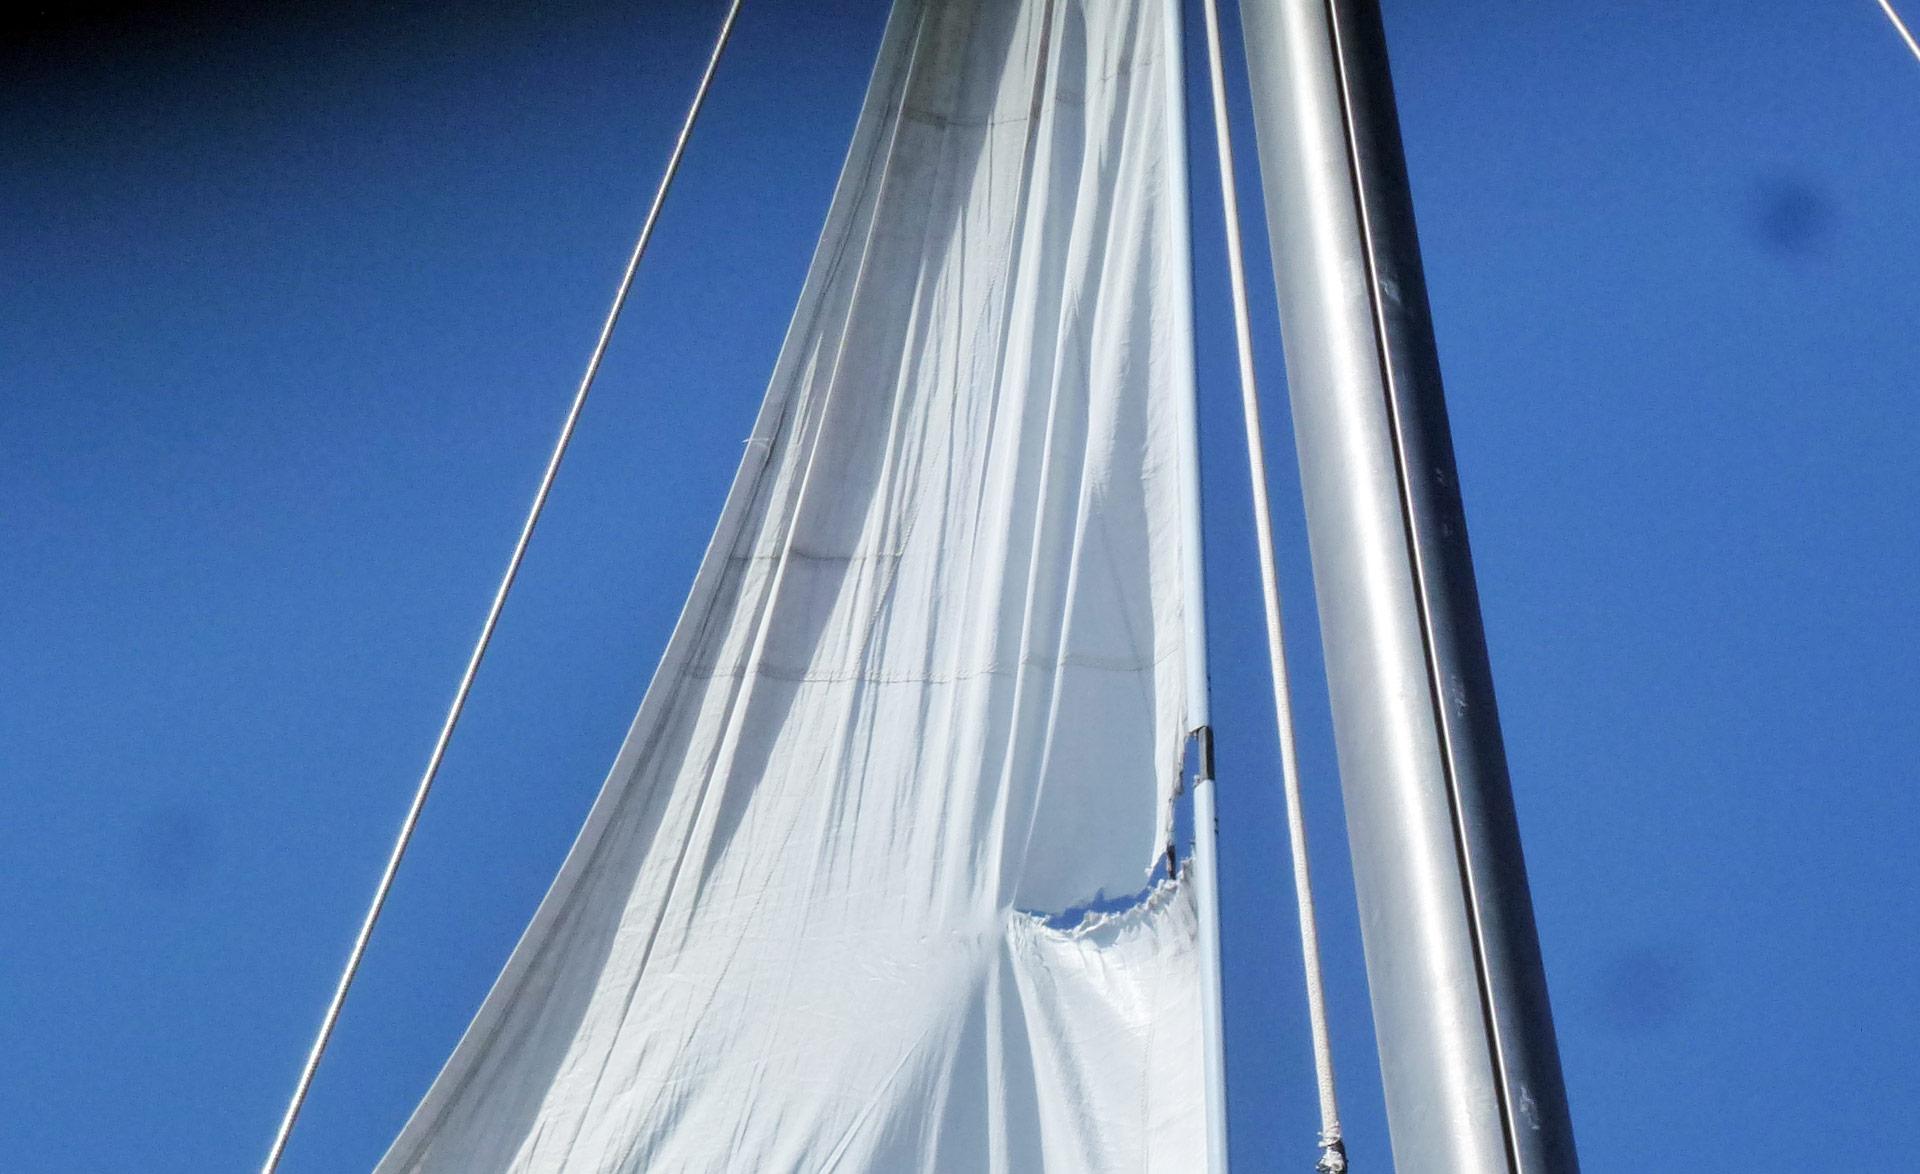 A teared off sail.